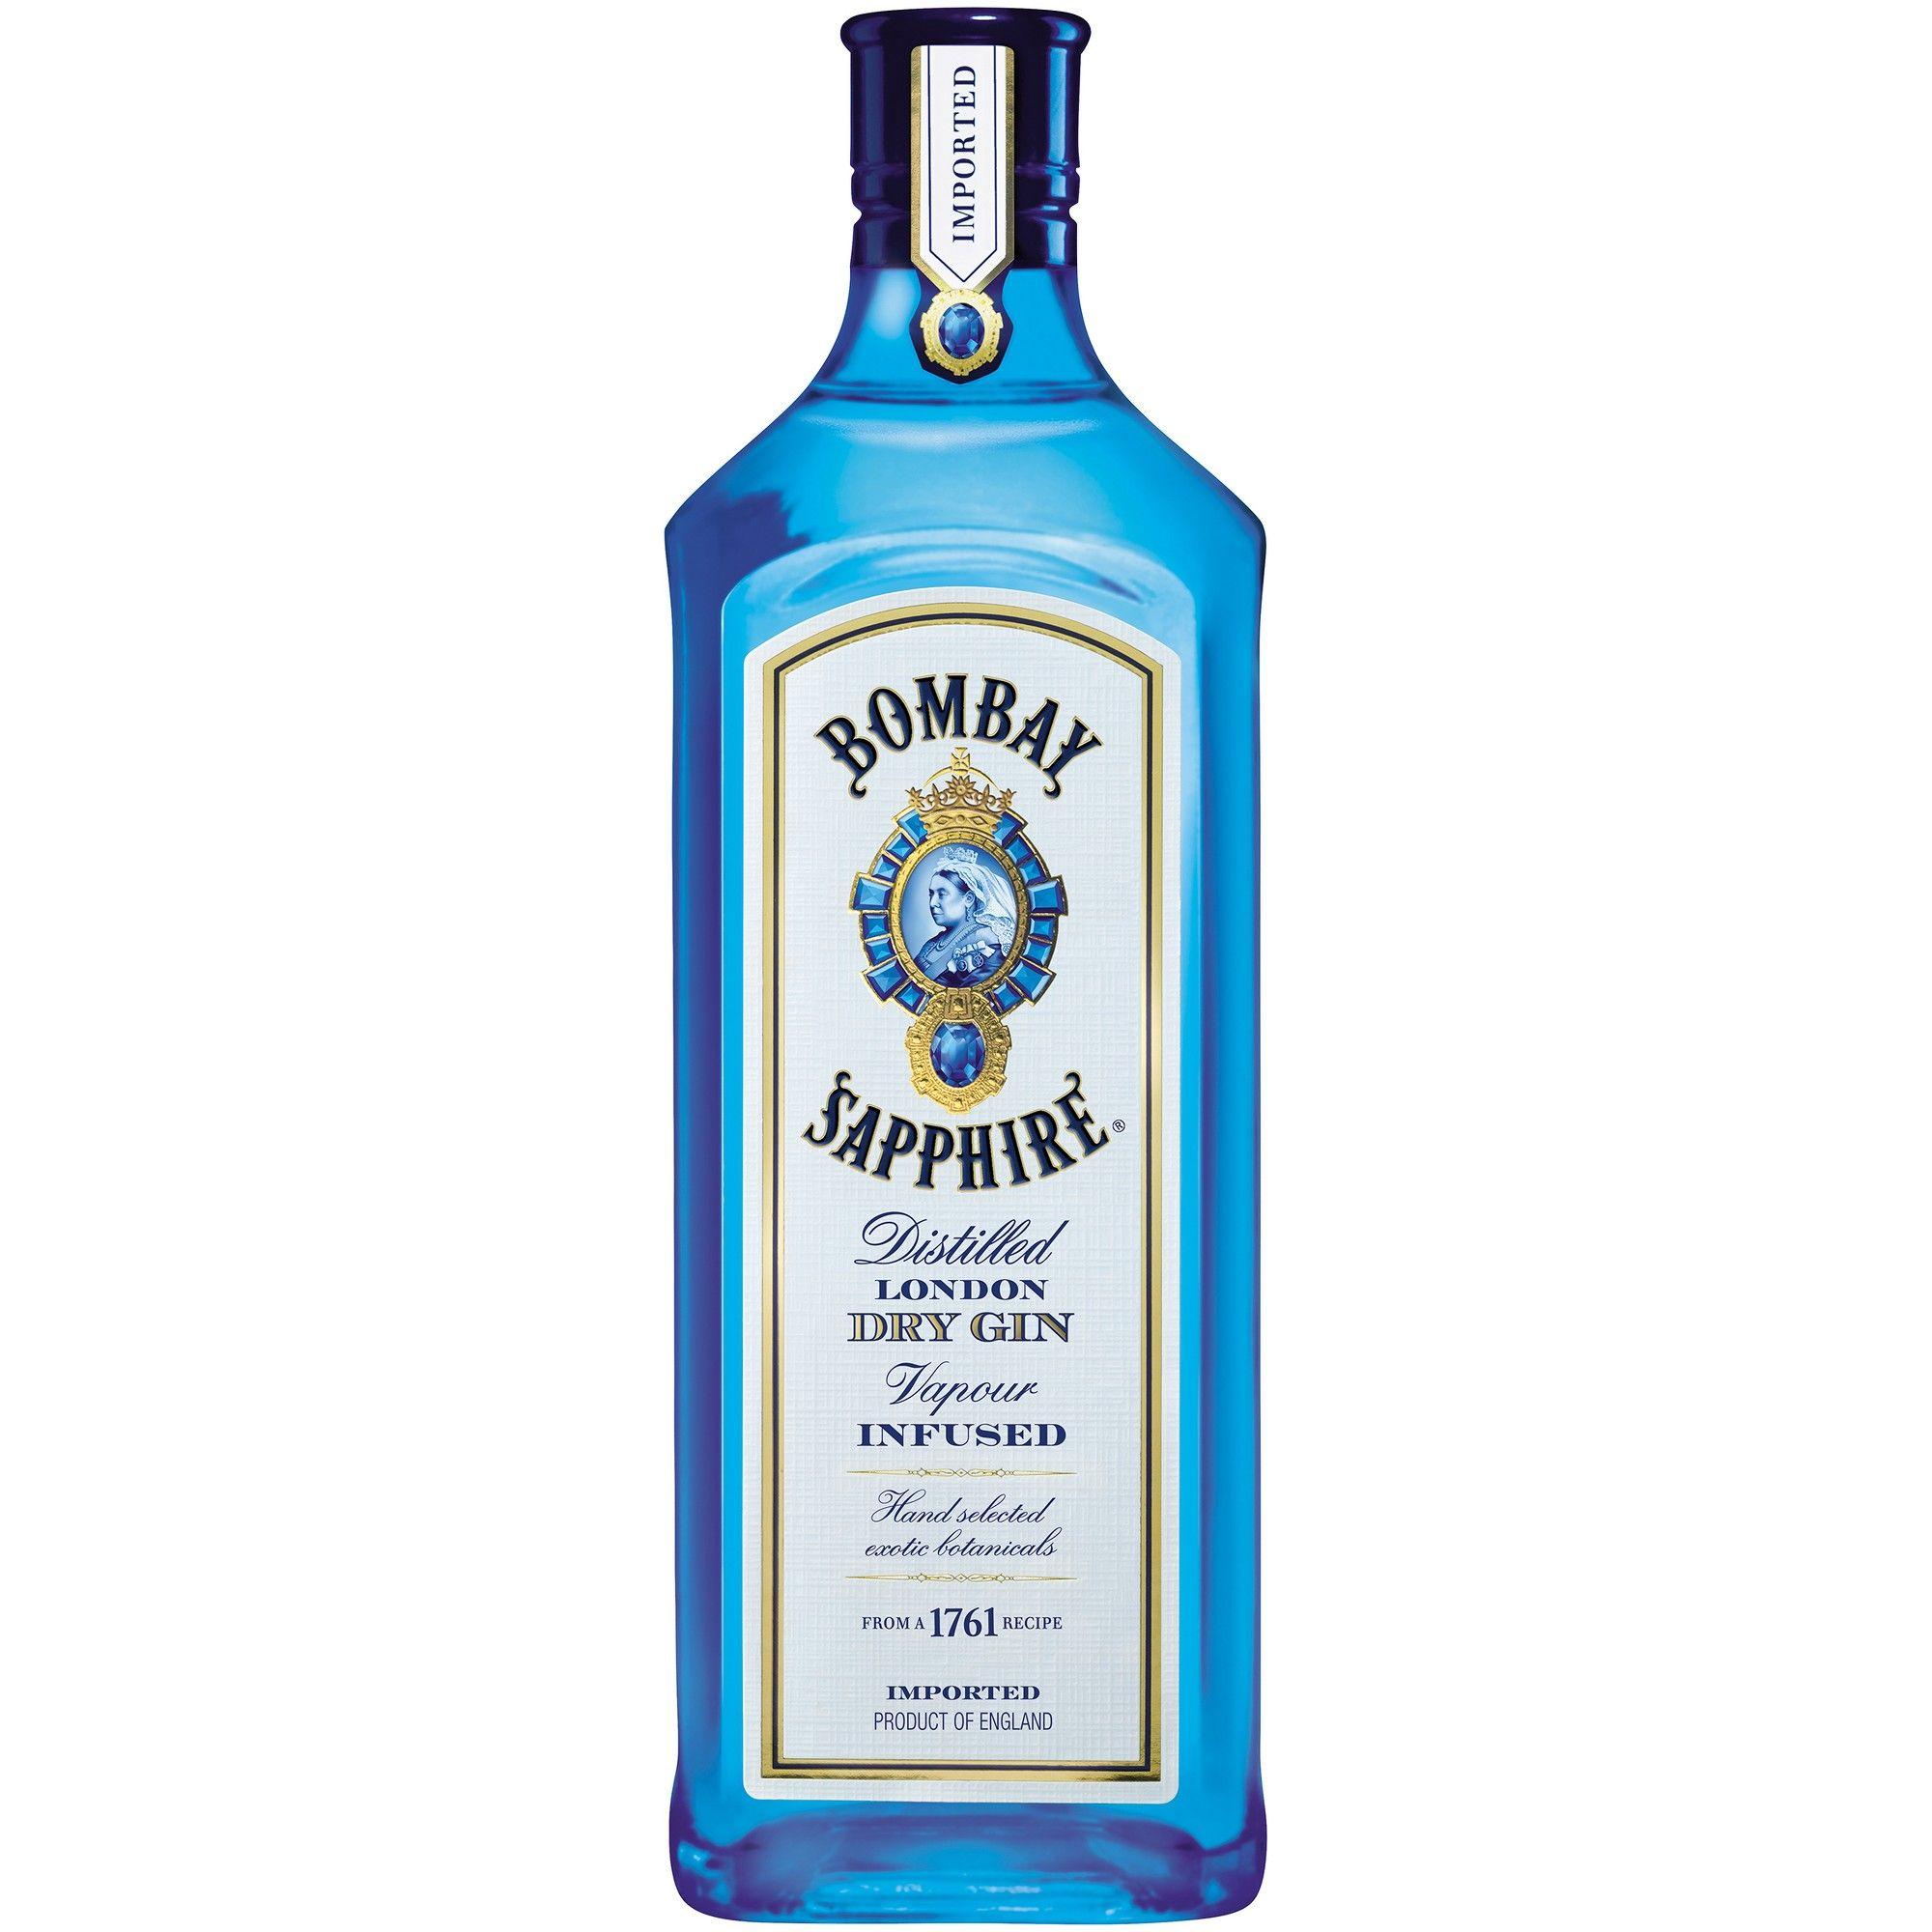 Bombay London Dry Gin 750ml Bottle Bombay Sapphire Gin Dry Gin Gin